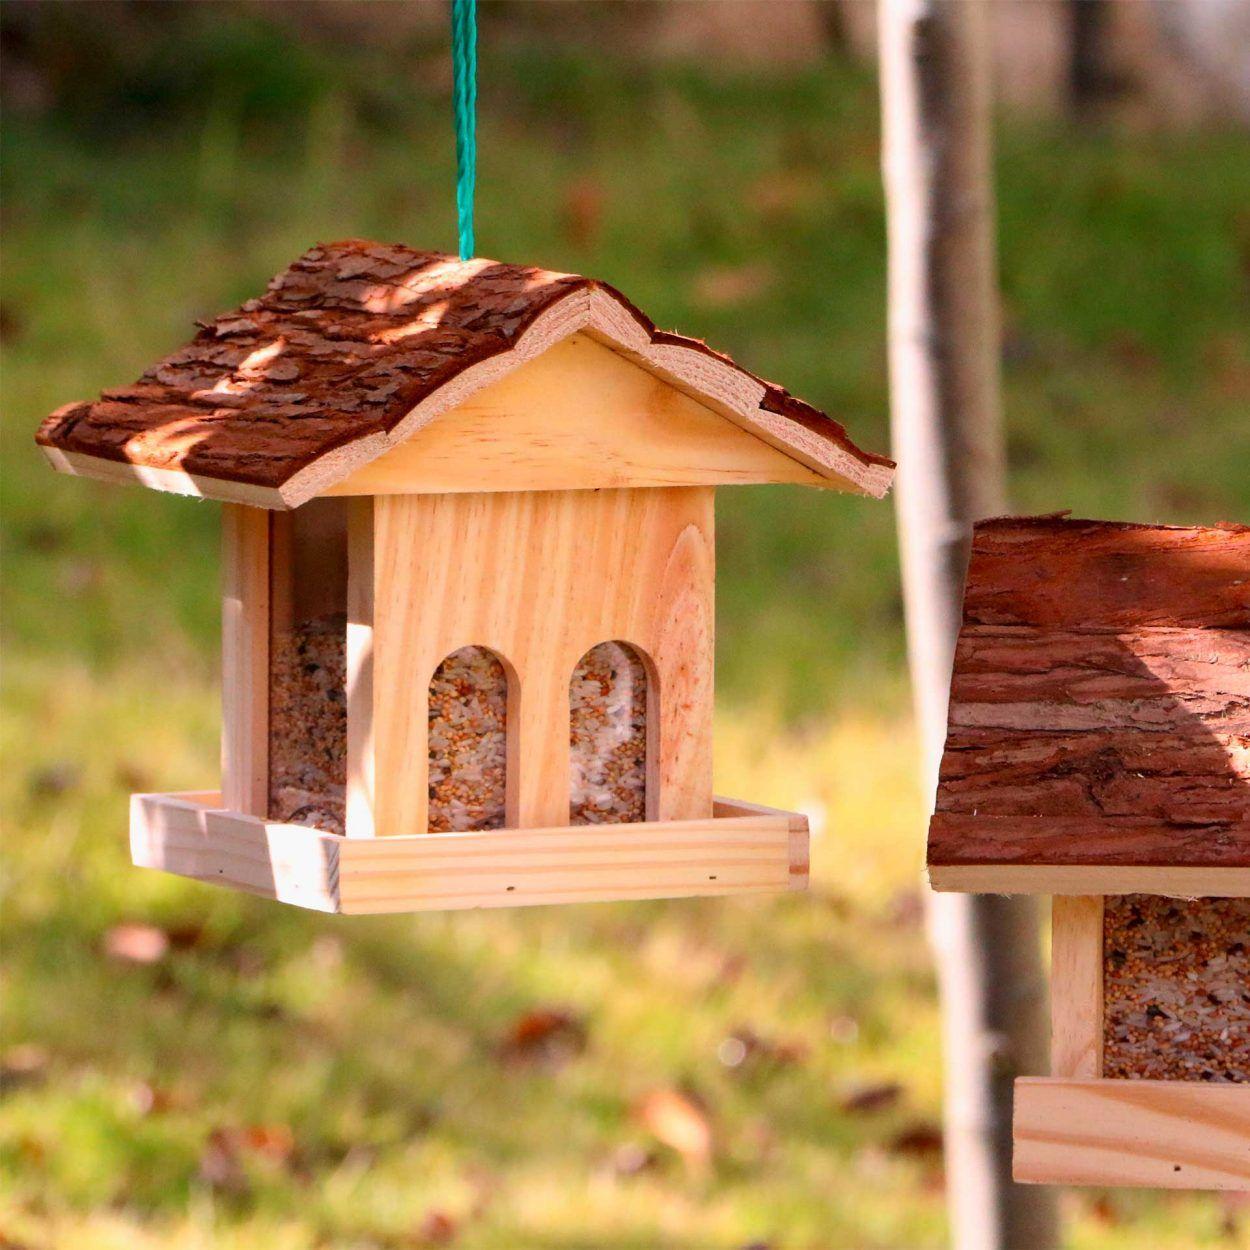 Mangeoire à oiseaux - 18 x 18 x 19 cm